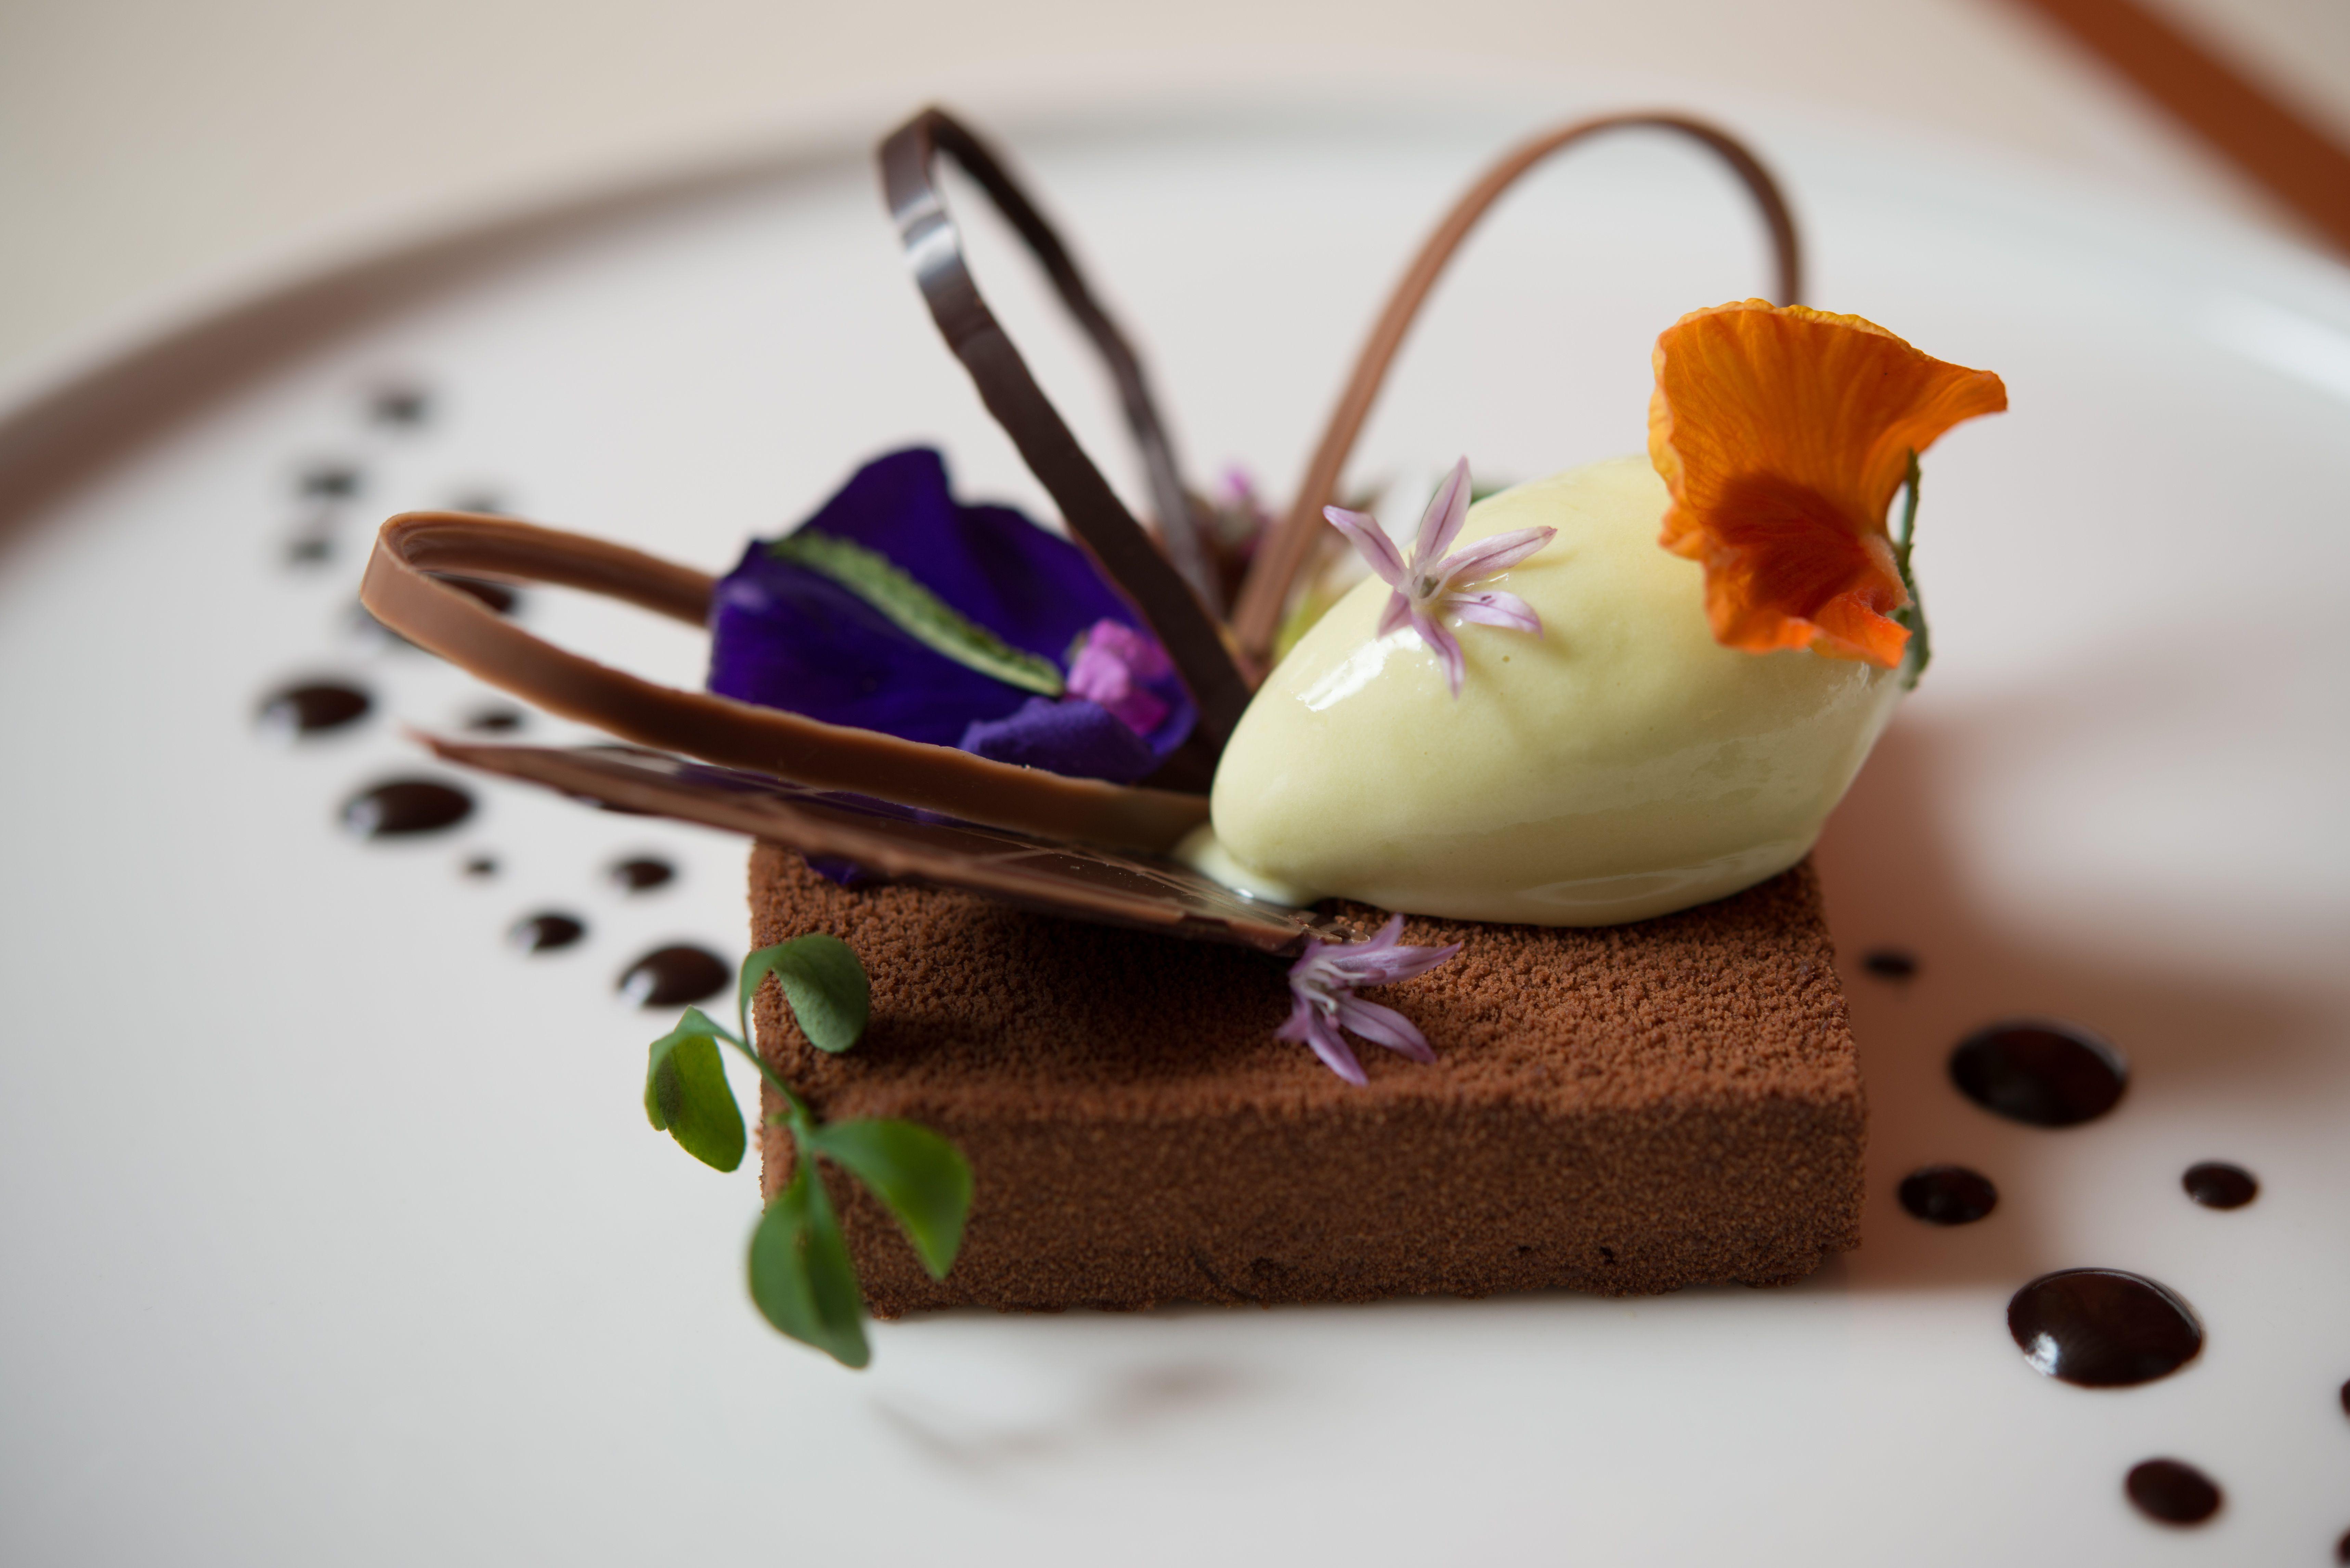 1 star michelin dessert #frenchy #icecream #cake #food #luxe #chef